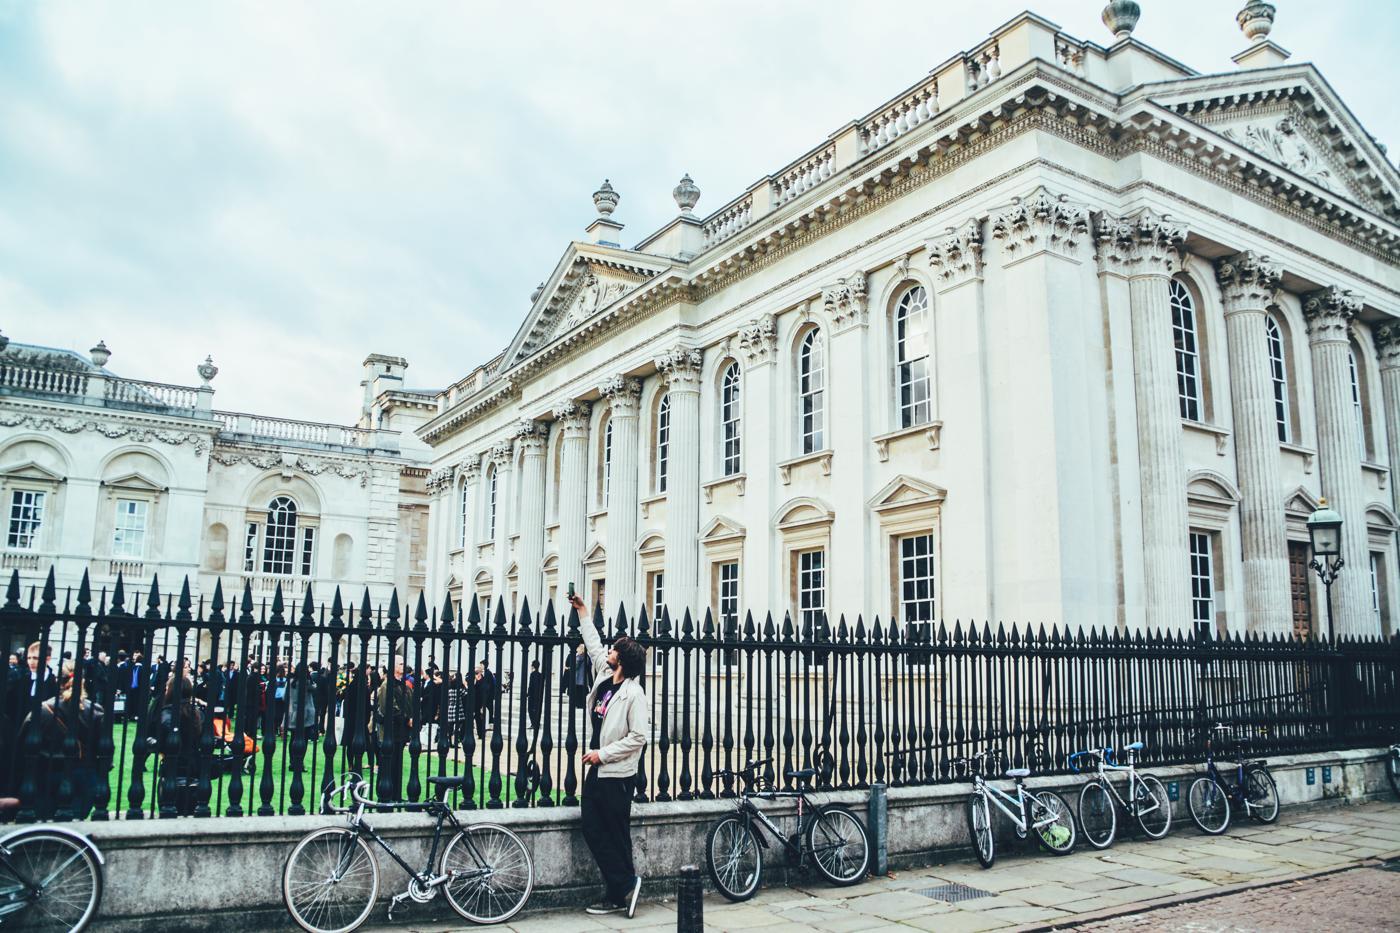 The University of Cambridge, Graduation, Senate House, Cambridge, England (14)